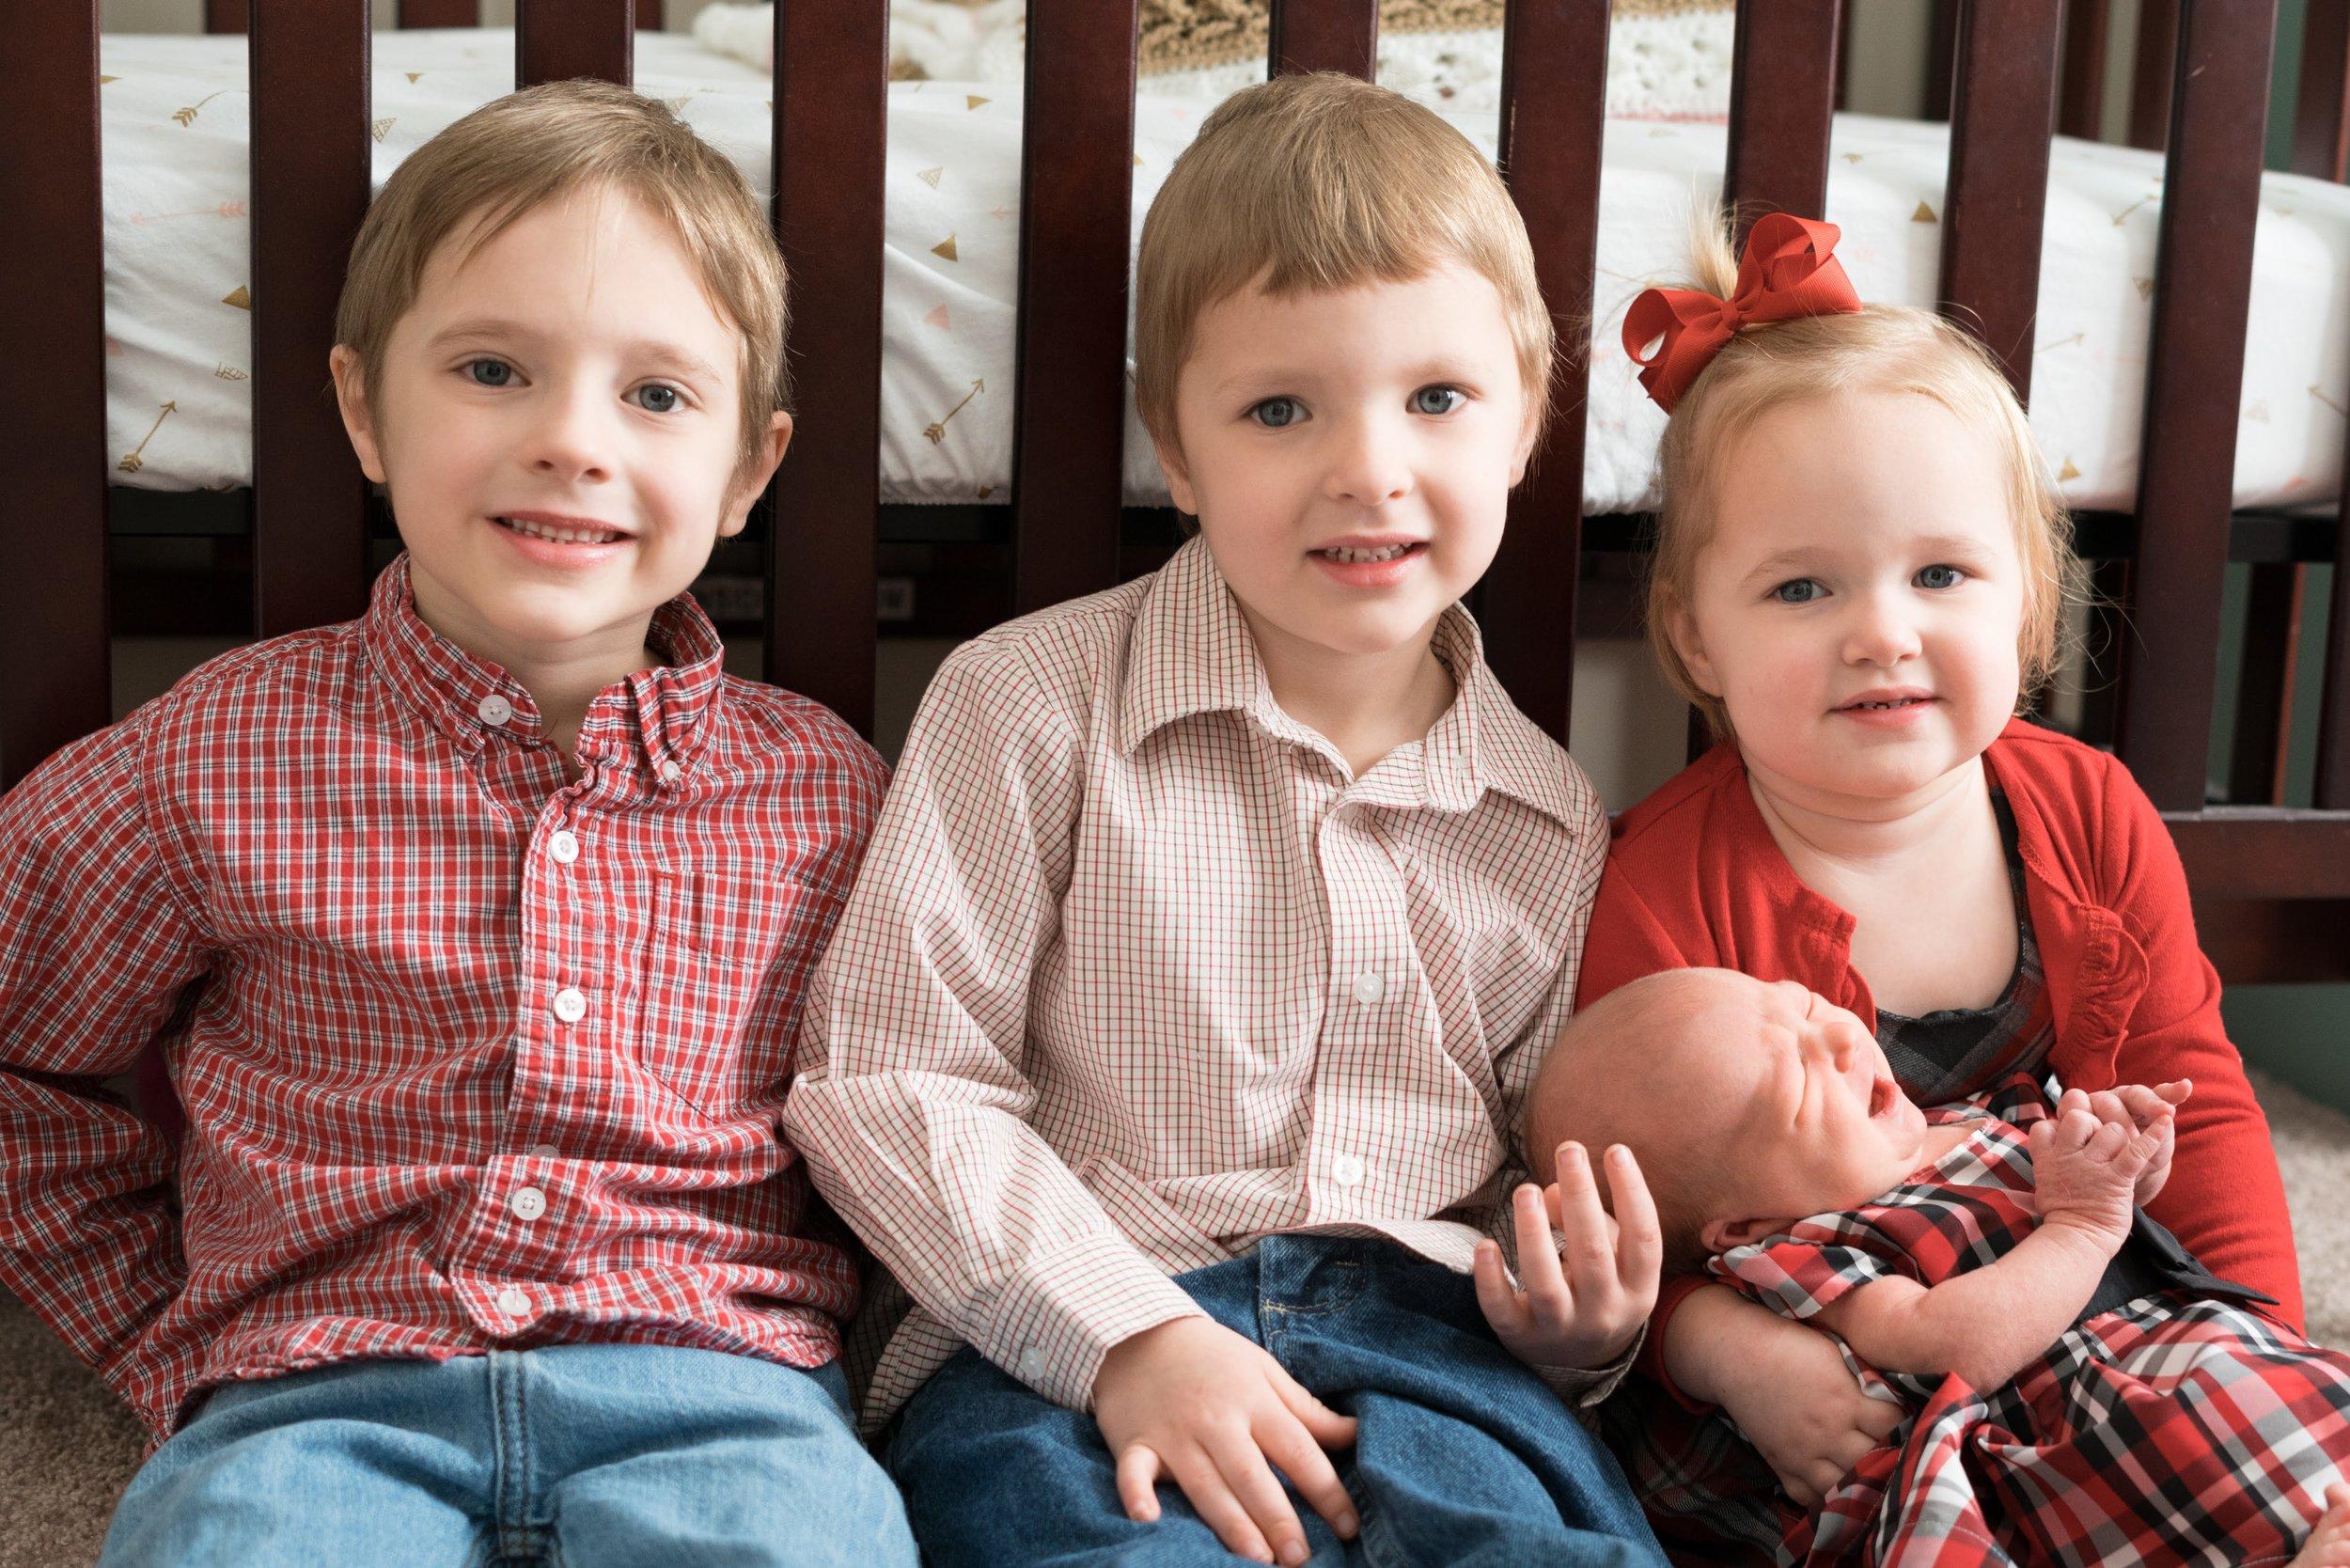 Baby girl and siblings